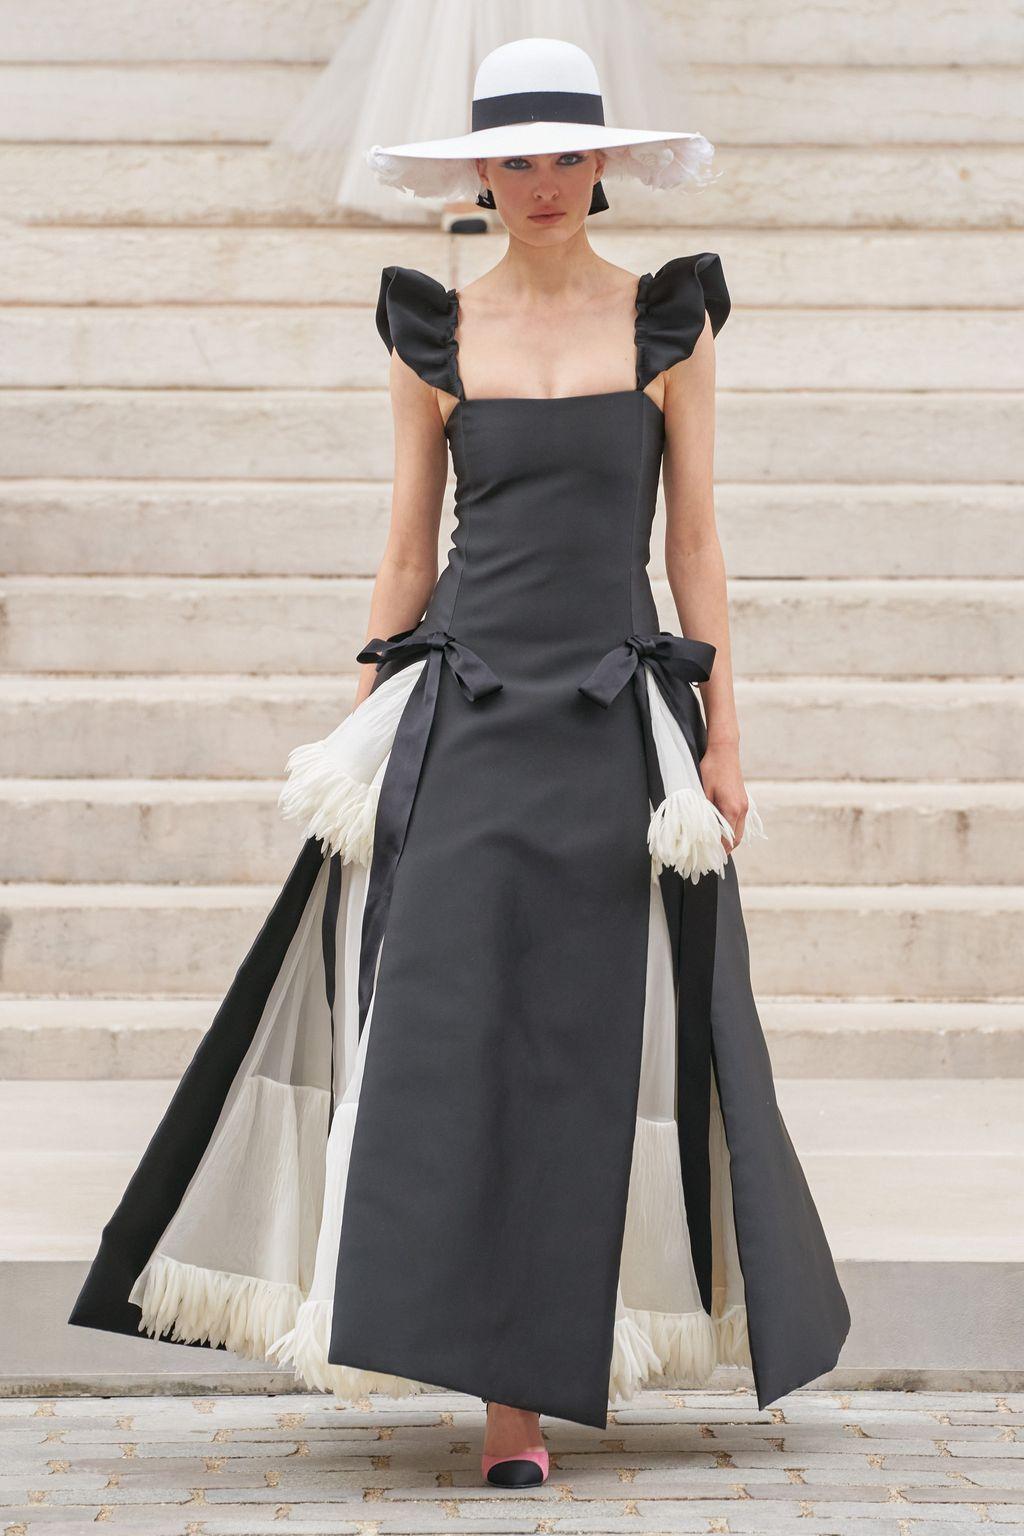 Chanel Haute Couture Fall 2021